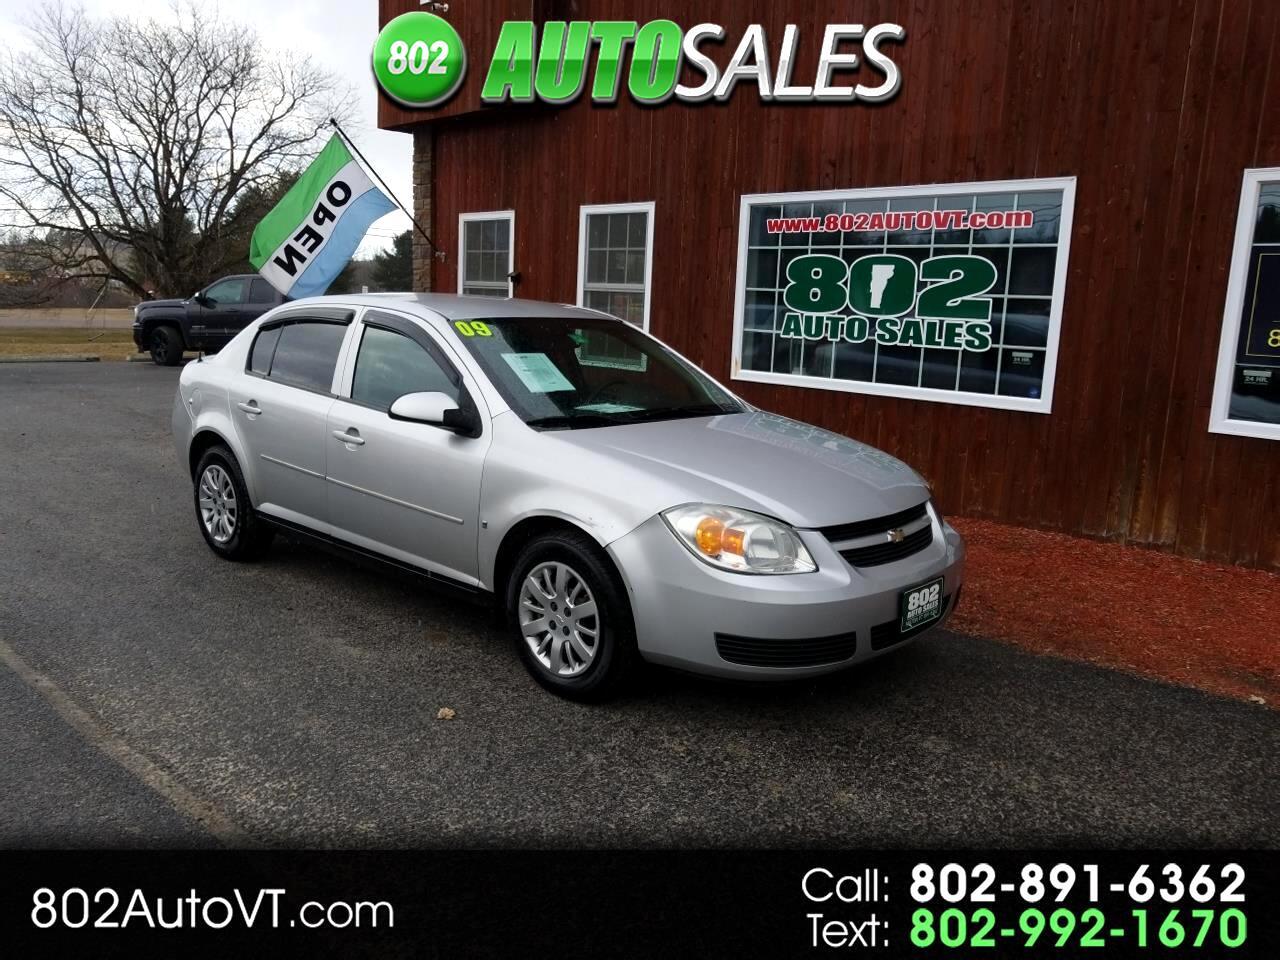 2009 Chevrolet Cobalt 4dr Sdn LT w/1LT